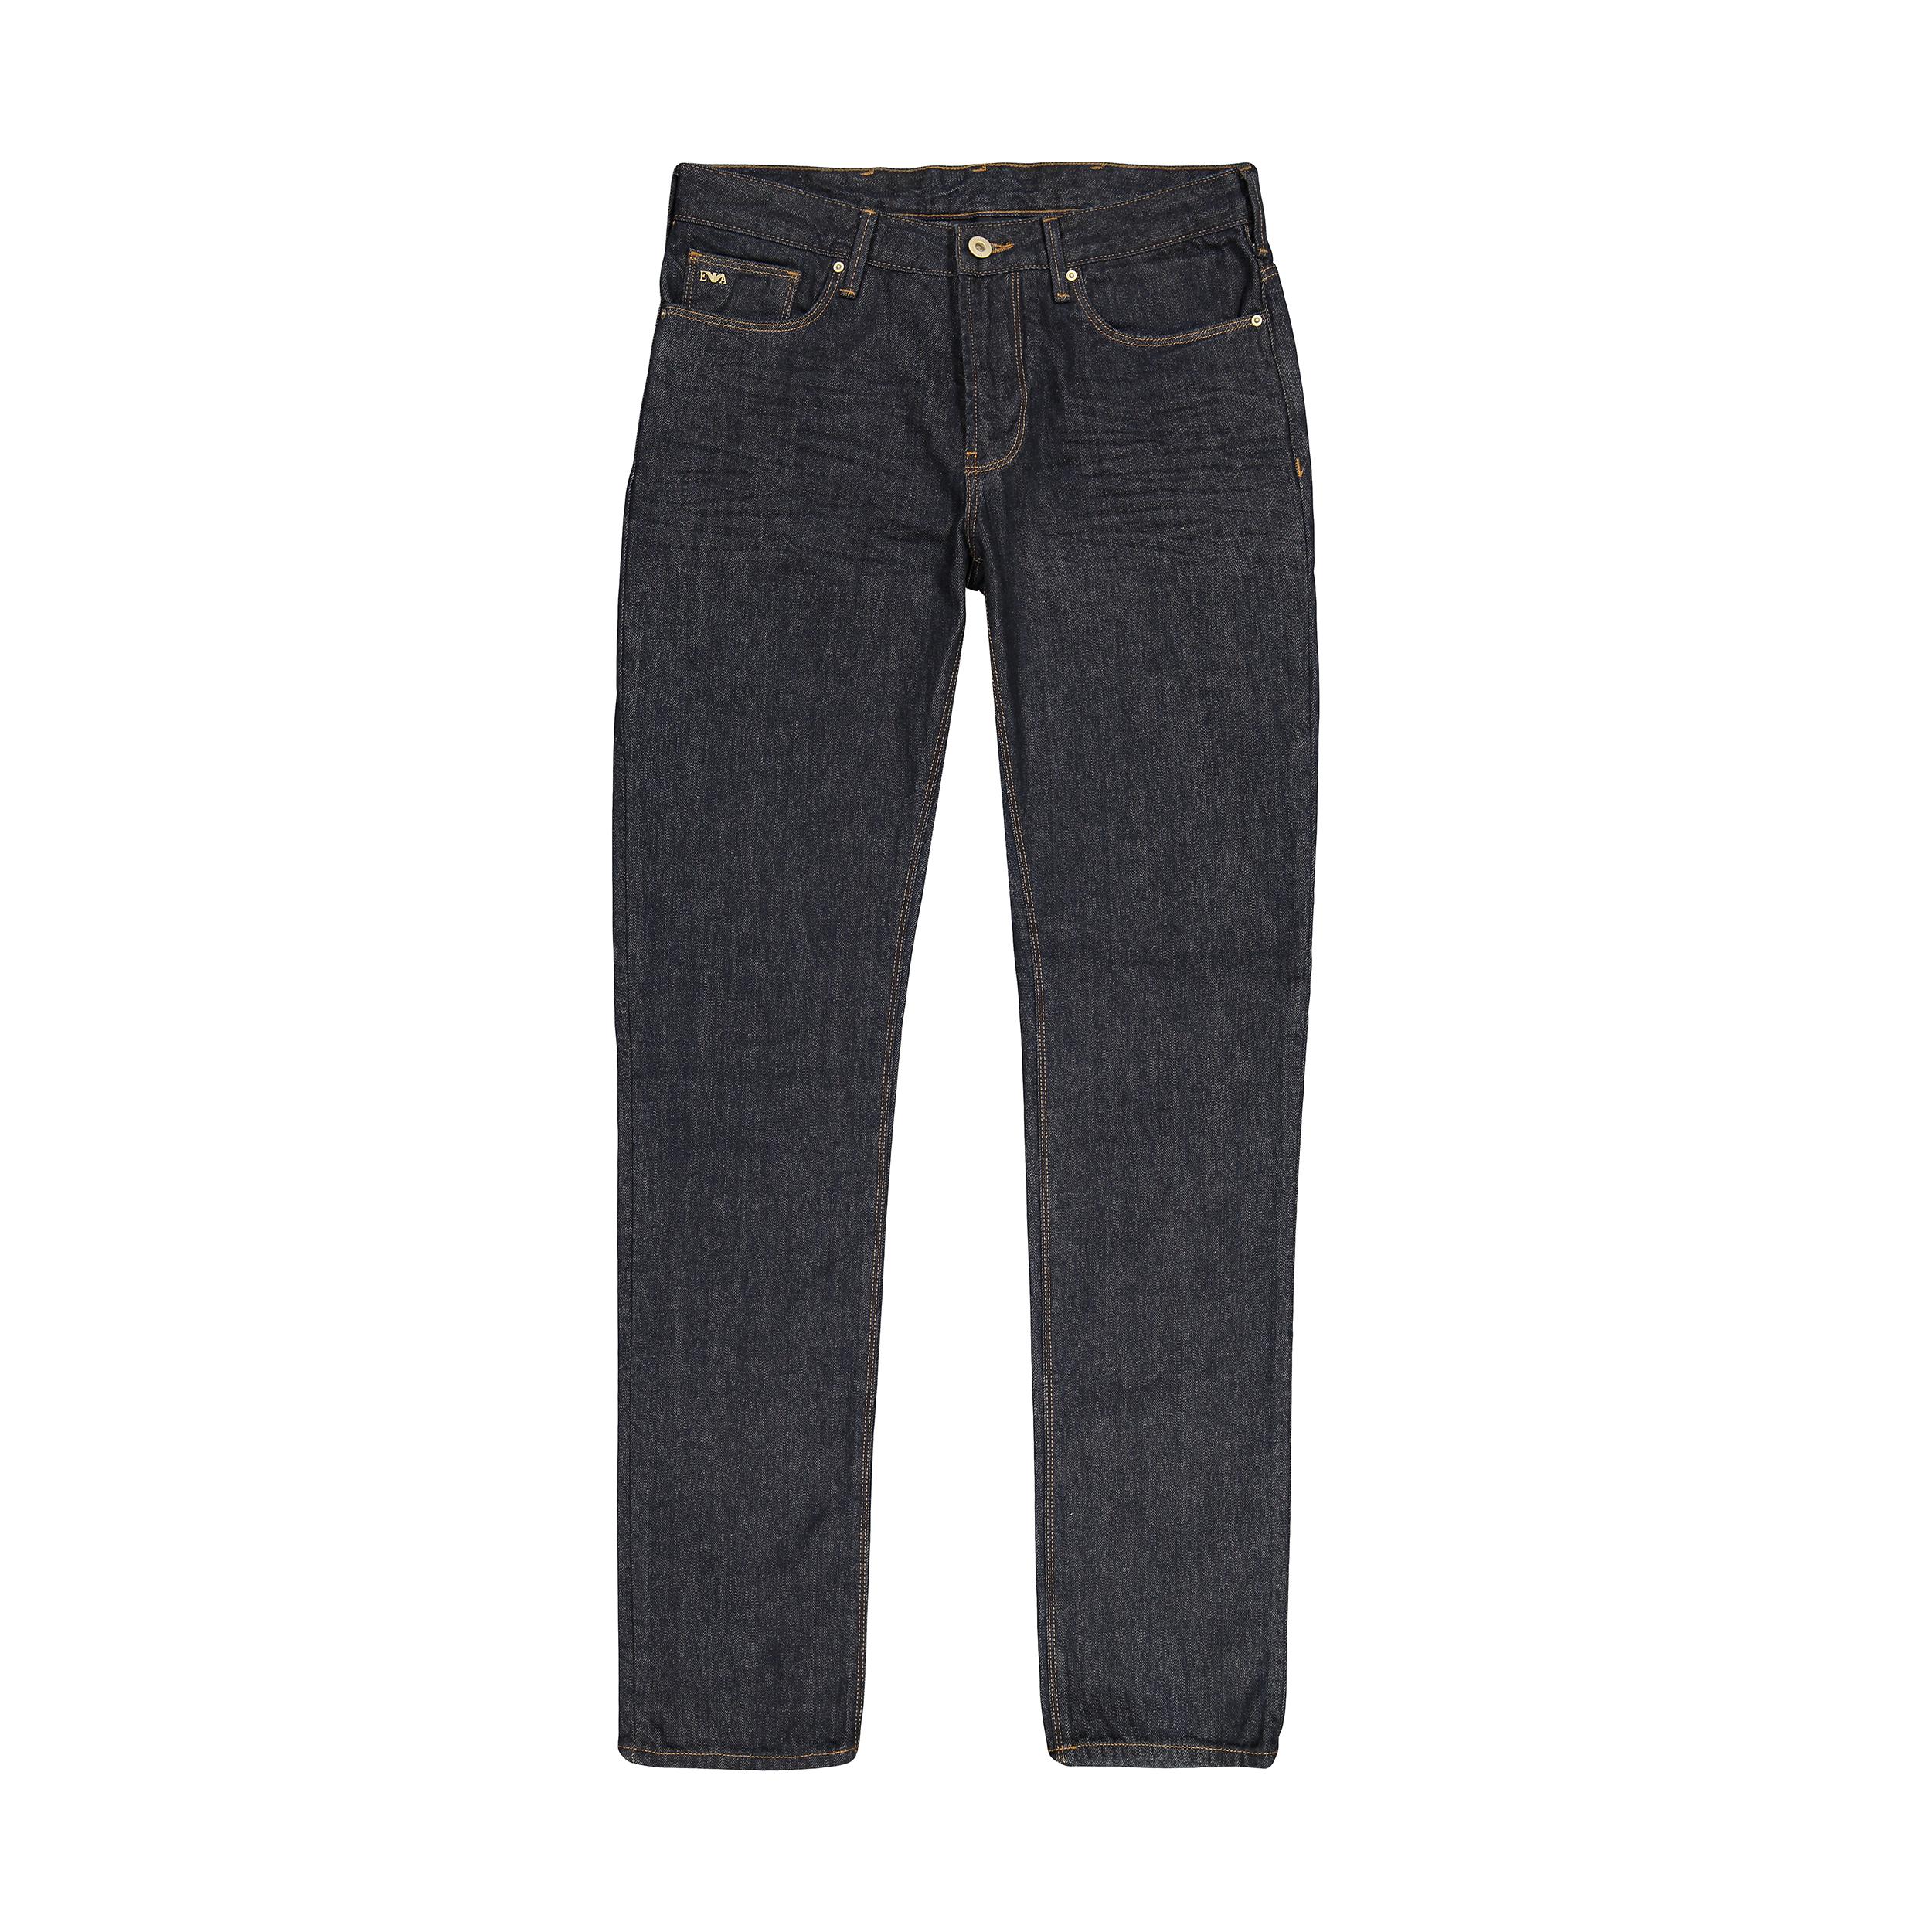 شلوار جین مردانه امپریو آرمانی مدل 6G1J061D6PZ-0941